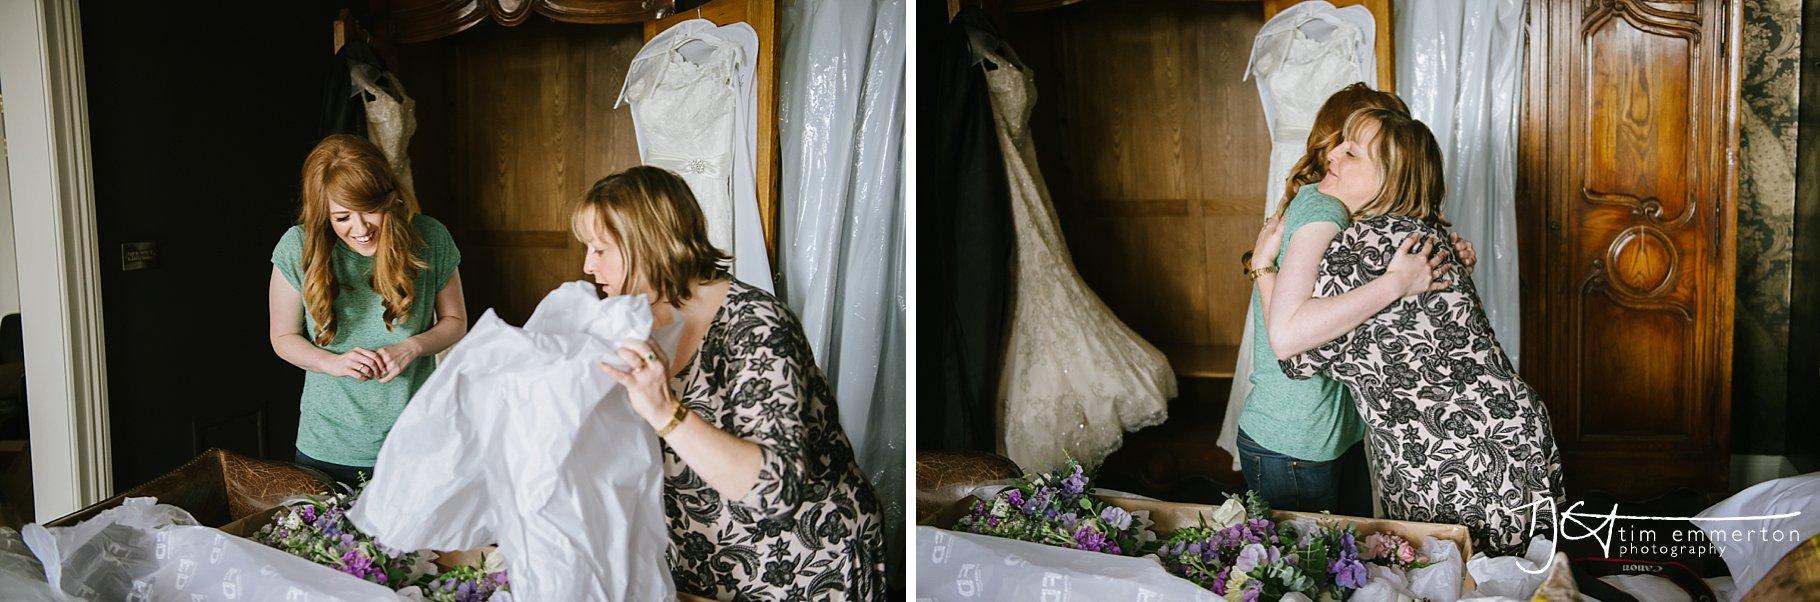 Eaves-Hall-Wedding-Photographer-017.jpg